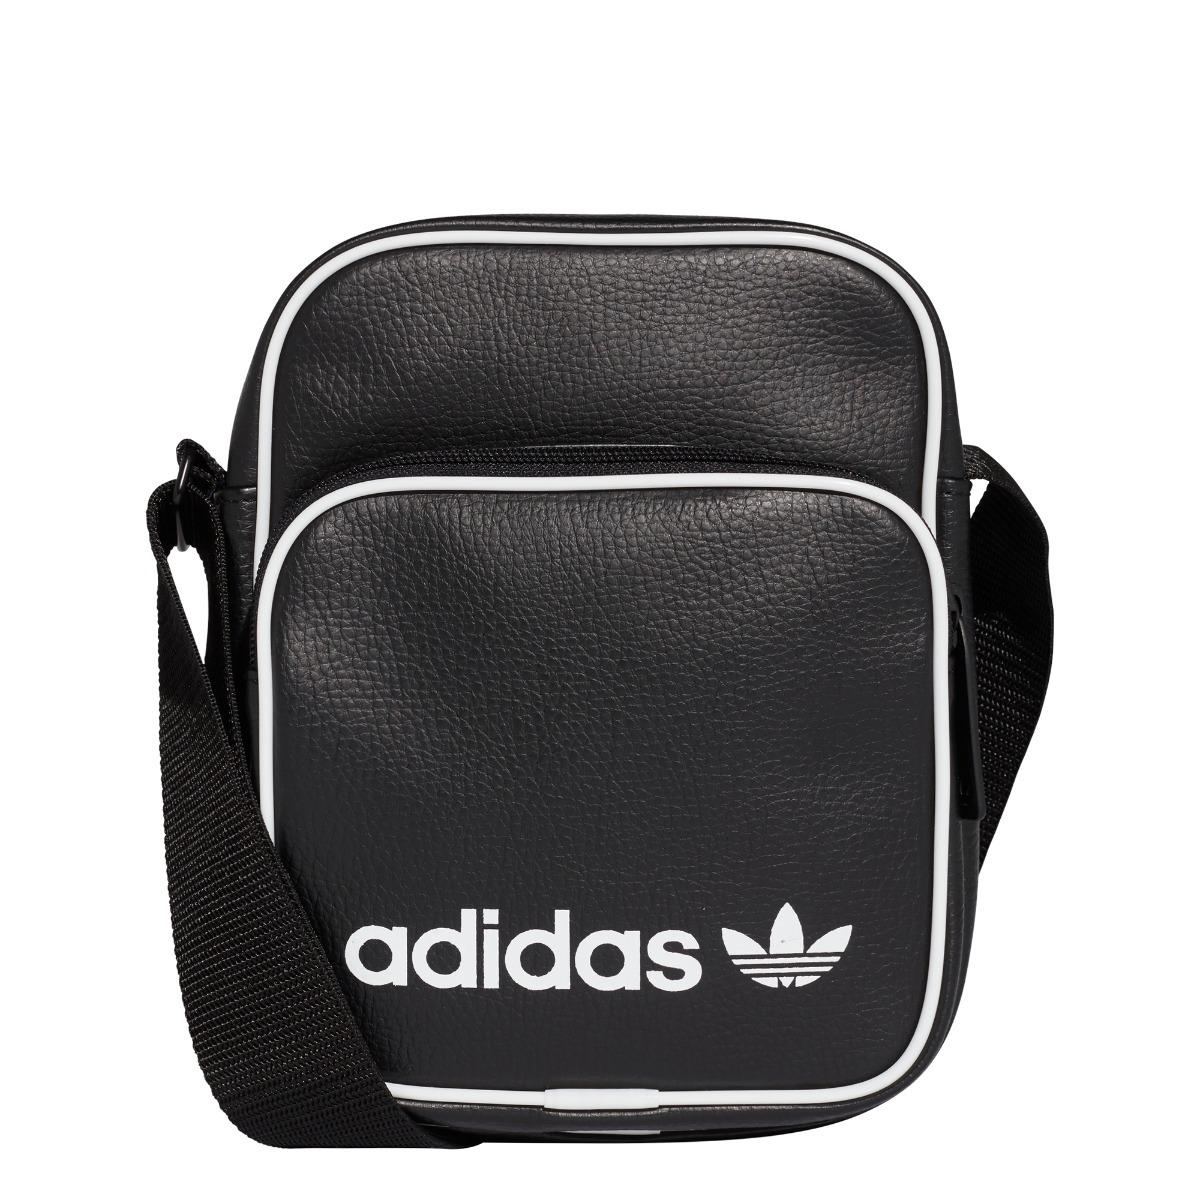 bolso adidas mini vintage negro unisex- originals. Cargando zoom. 6db3039dfc2f6